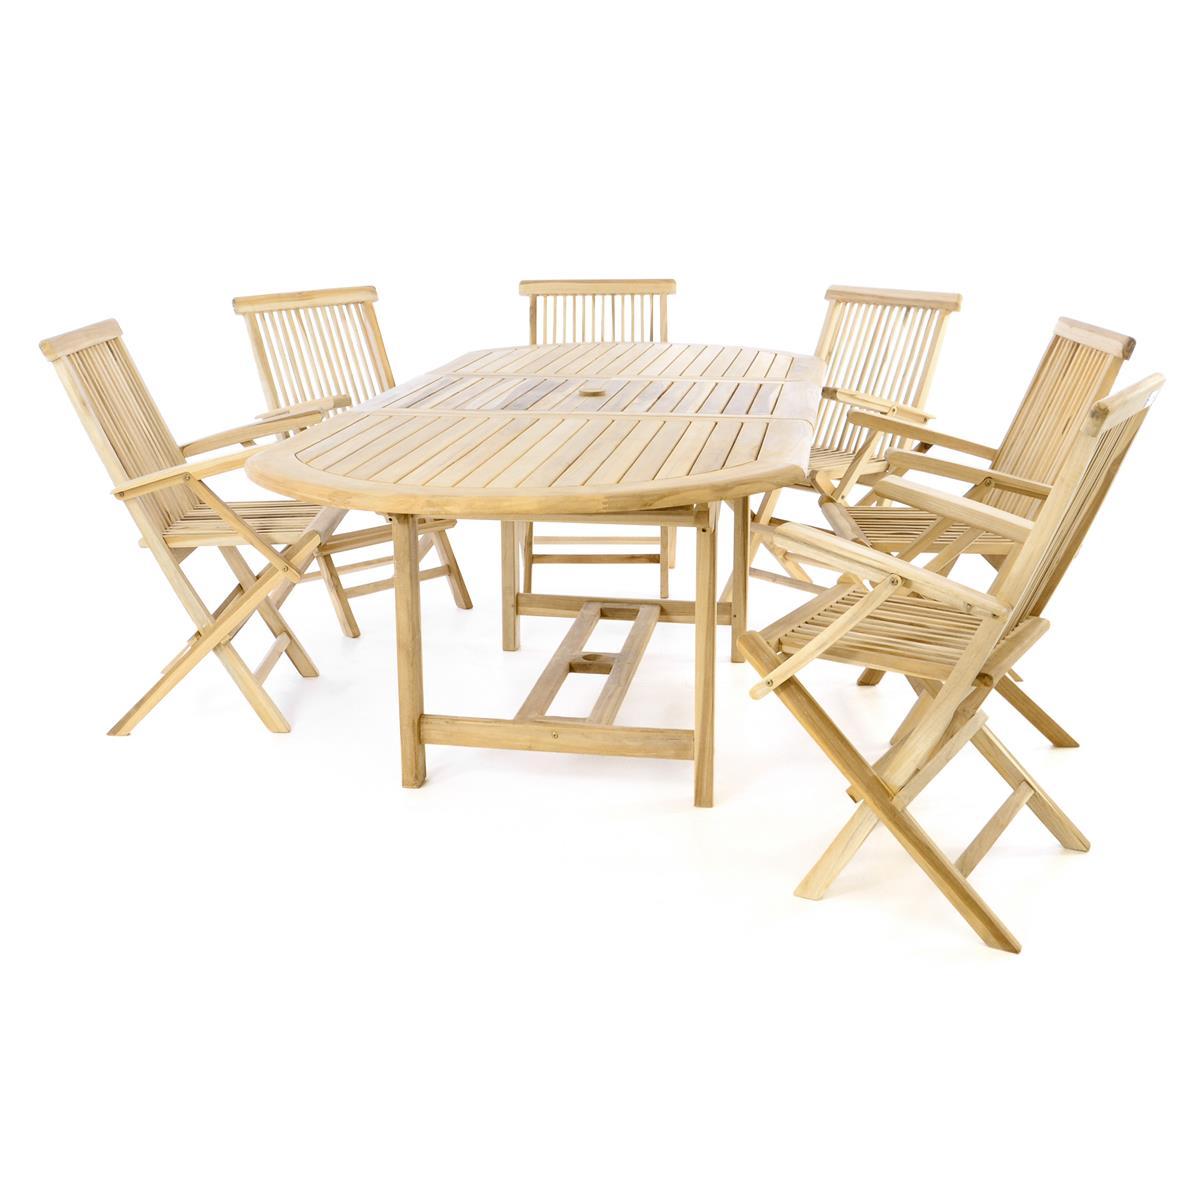 DIVERO Sitzgruppe Gartenmöbelset 6 Stühle Tisch 170/230 cm Teakholz natur